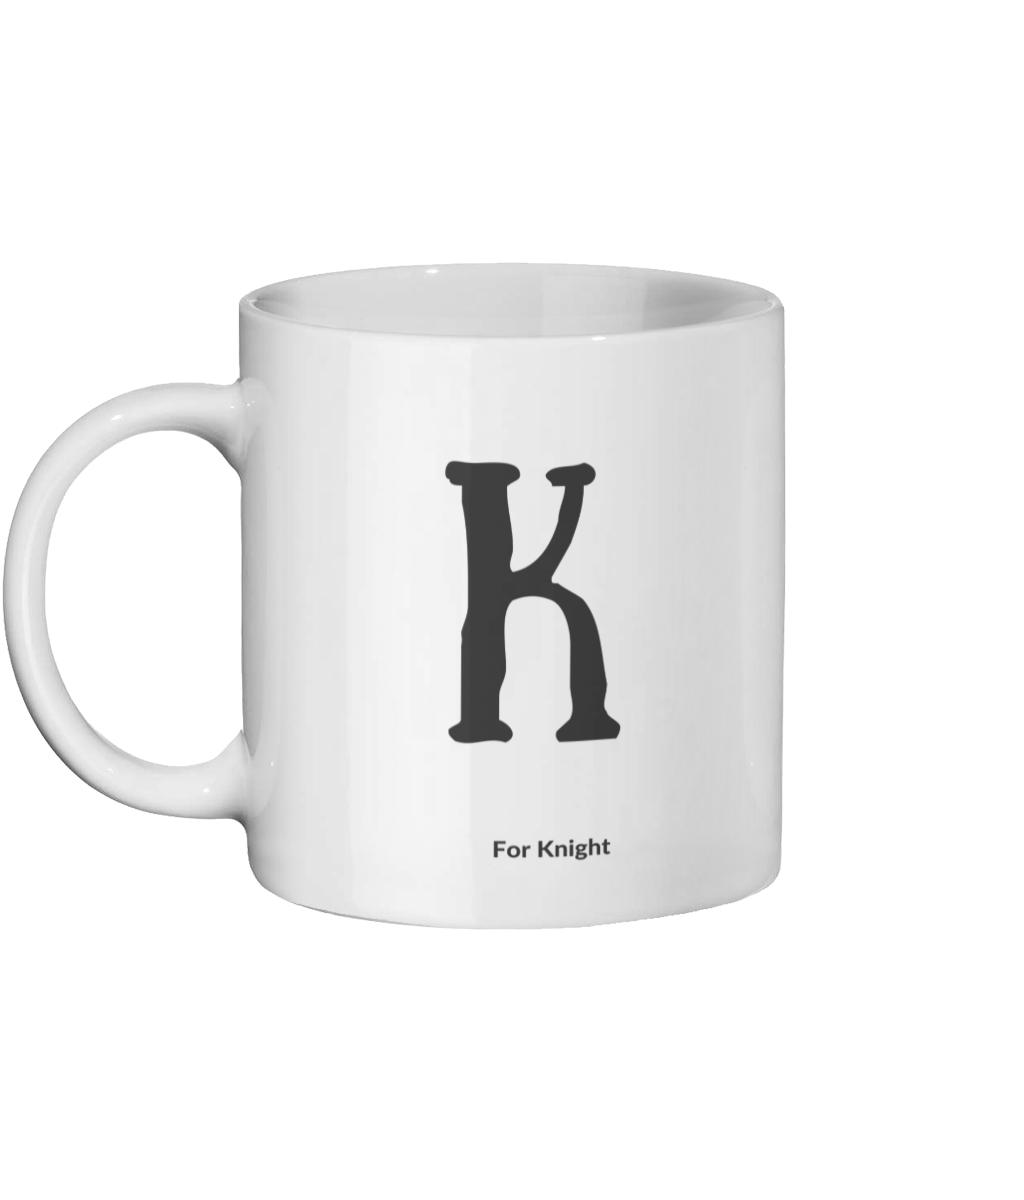 K for Knight Left-side